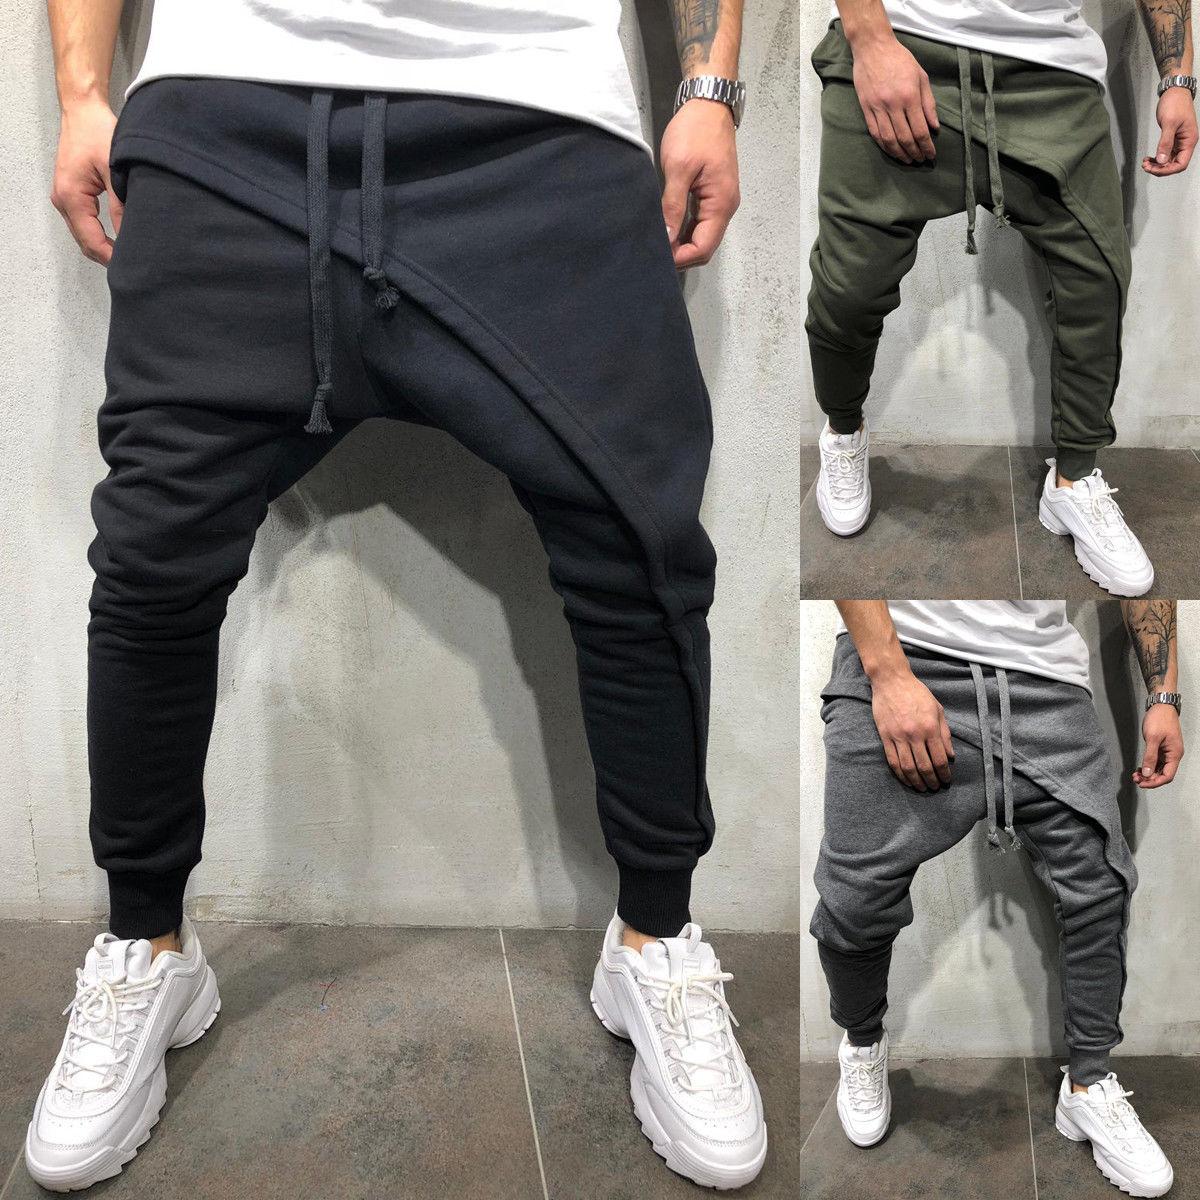 New Mens Casual Jogger Sportwear Baggy Harem Pants Slacks Trousers Sweatpants US